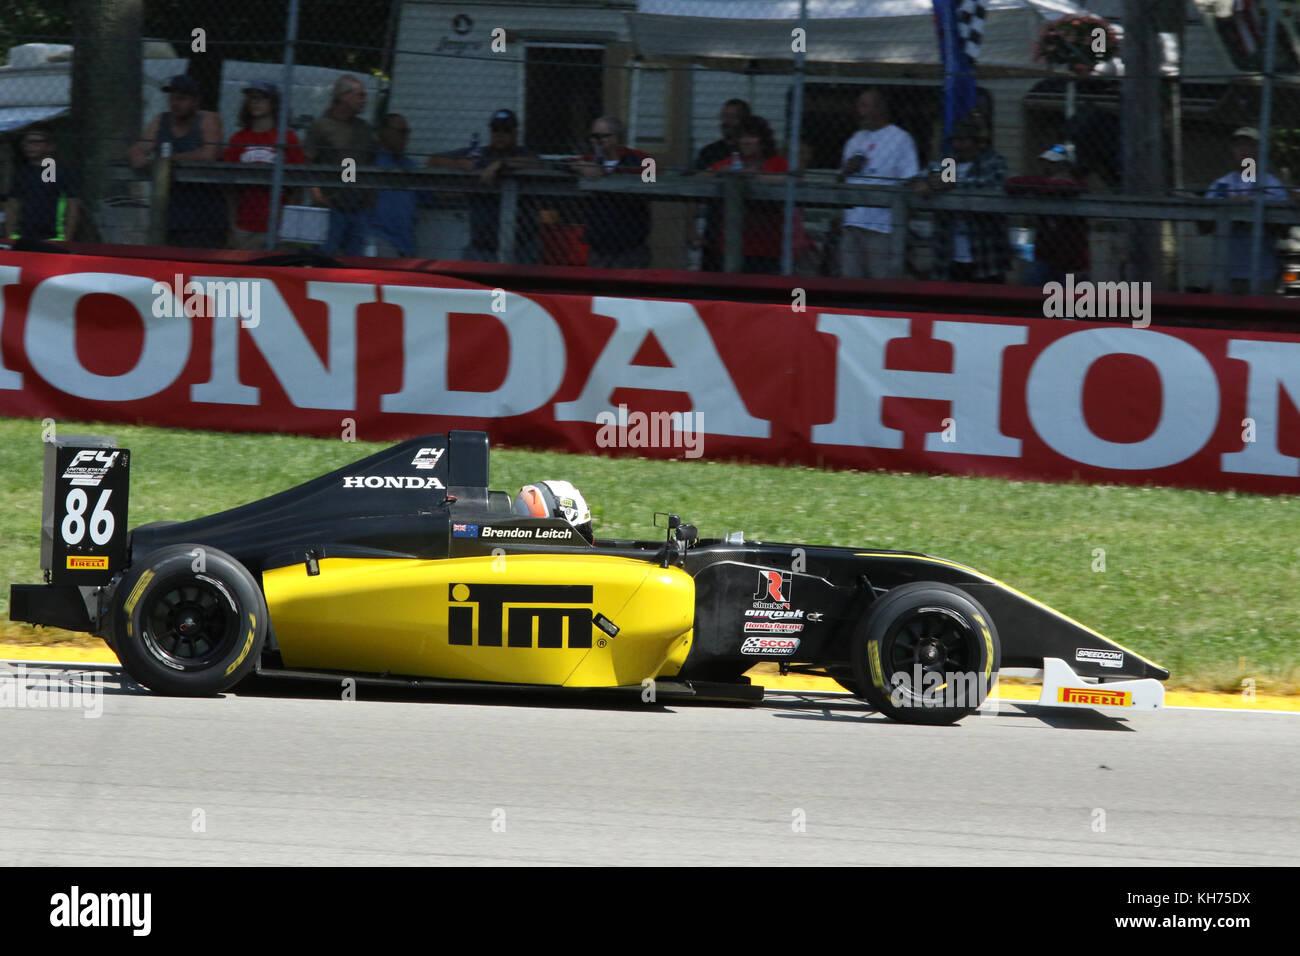 Brendon Leitch. Auto86.sponsor kiwi Motorsport Formel 4 Rennen.mid-Ohio-Kurs. Lexington, Mansfield, Ohio, USA. Stockbild